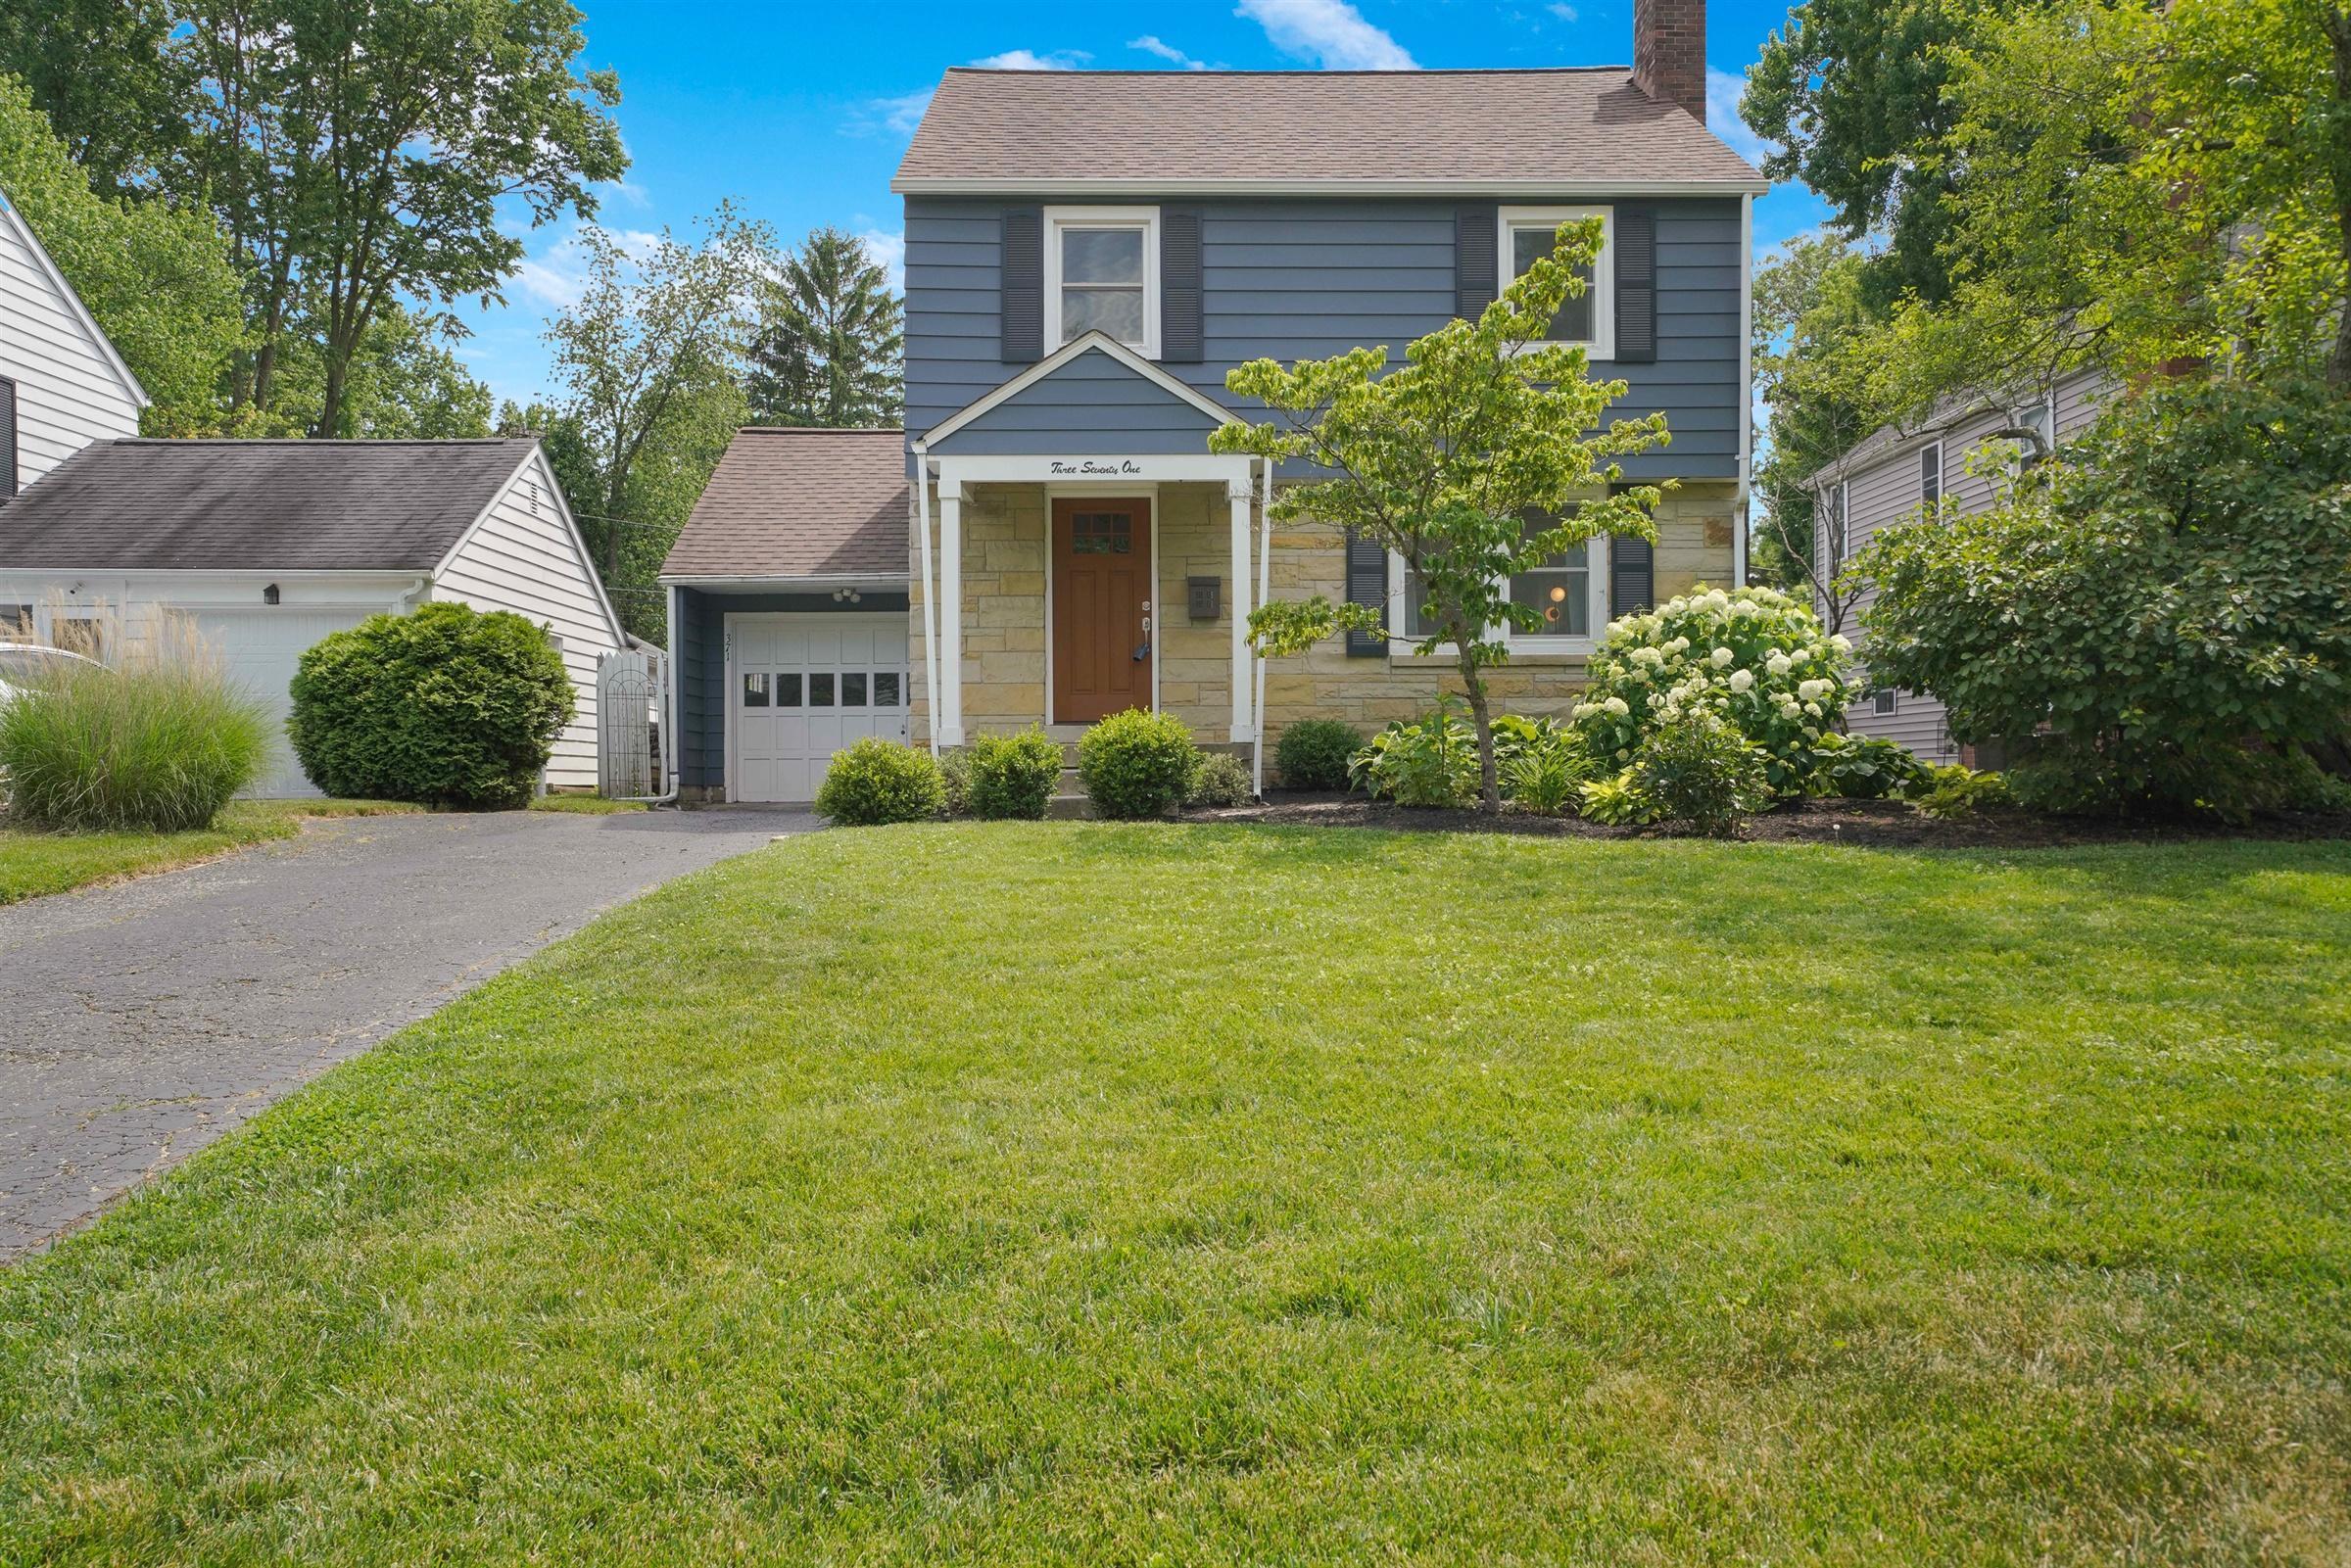 371 Park Boulevard, Worthington, Ohio 43085, 3 Bedrooms Bedrooms, ,2 BathroomsBathrooms,Residential,For Sale,Park,220019286